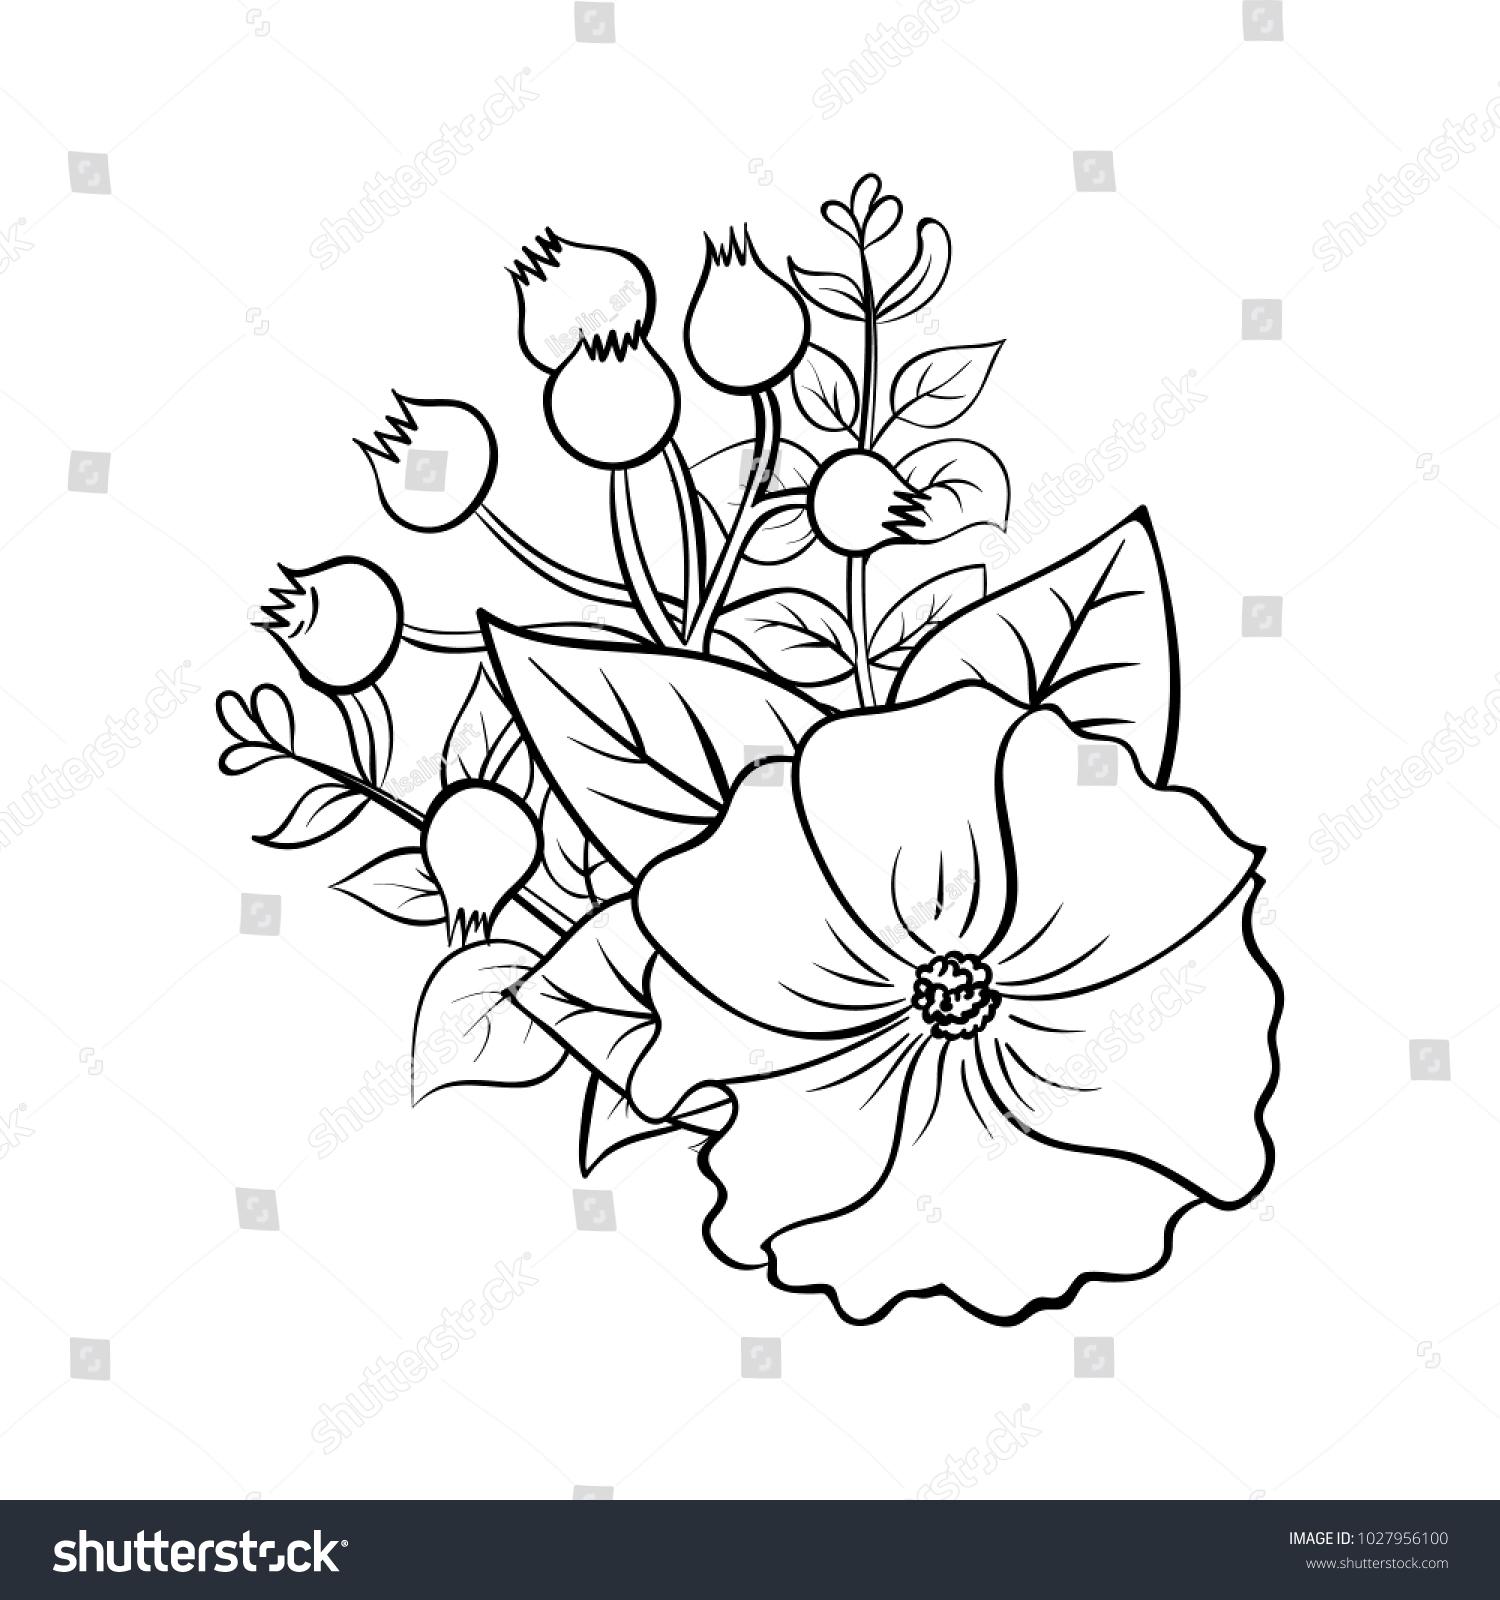 Vector Outline Illustration Flower Bouquet Black Stock Vector ...